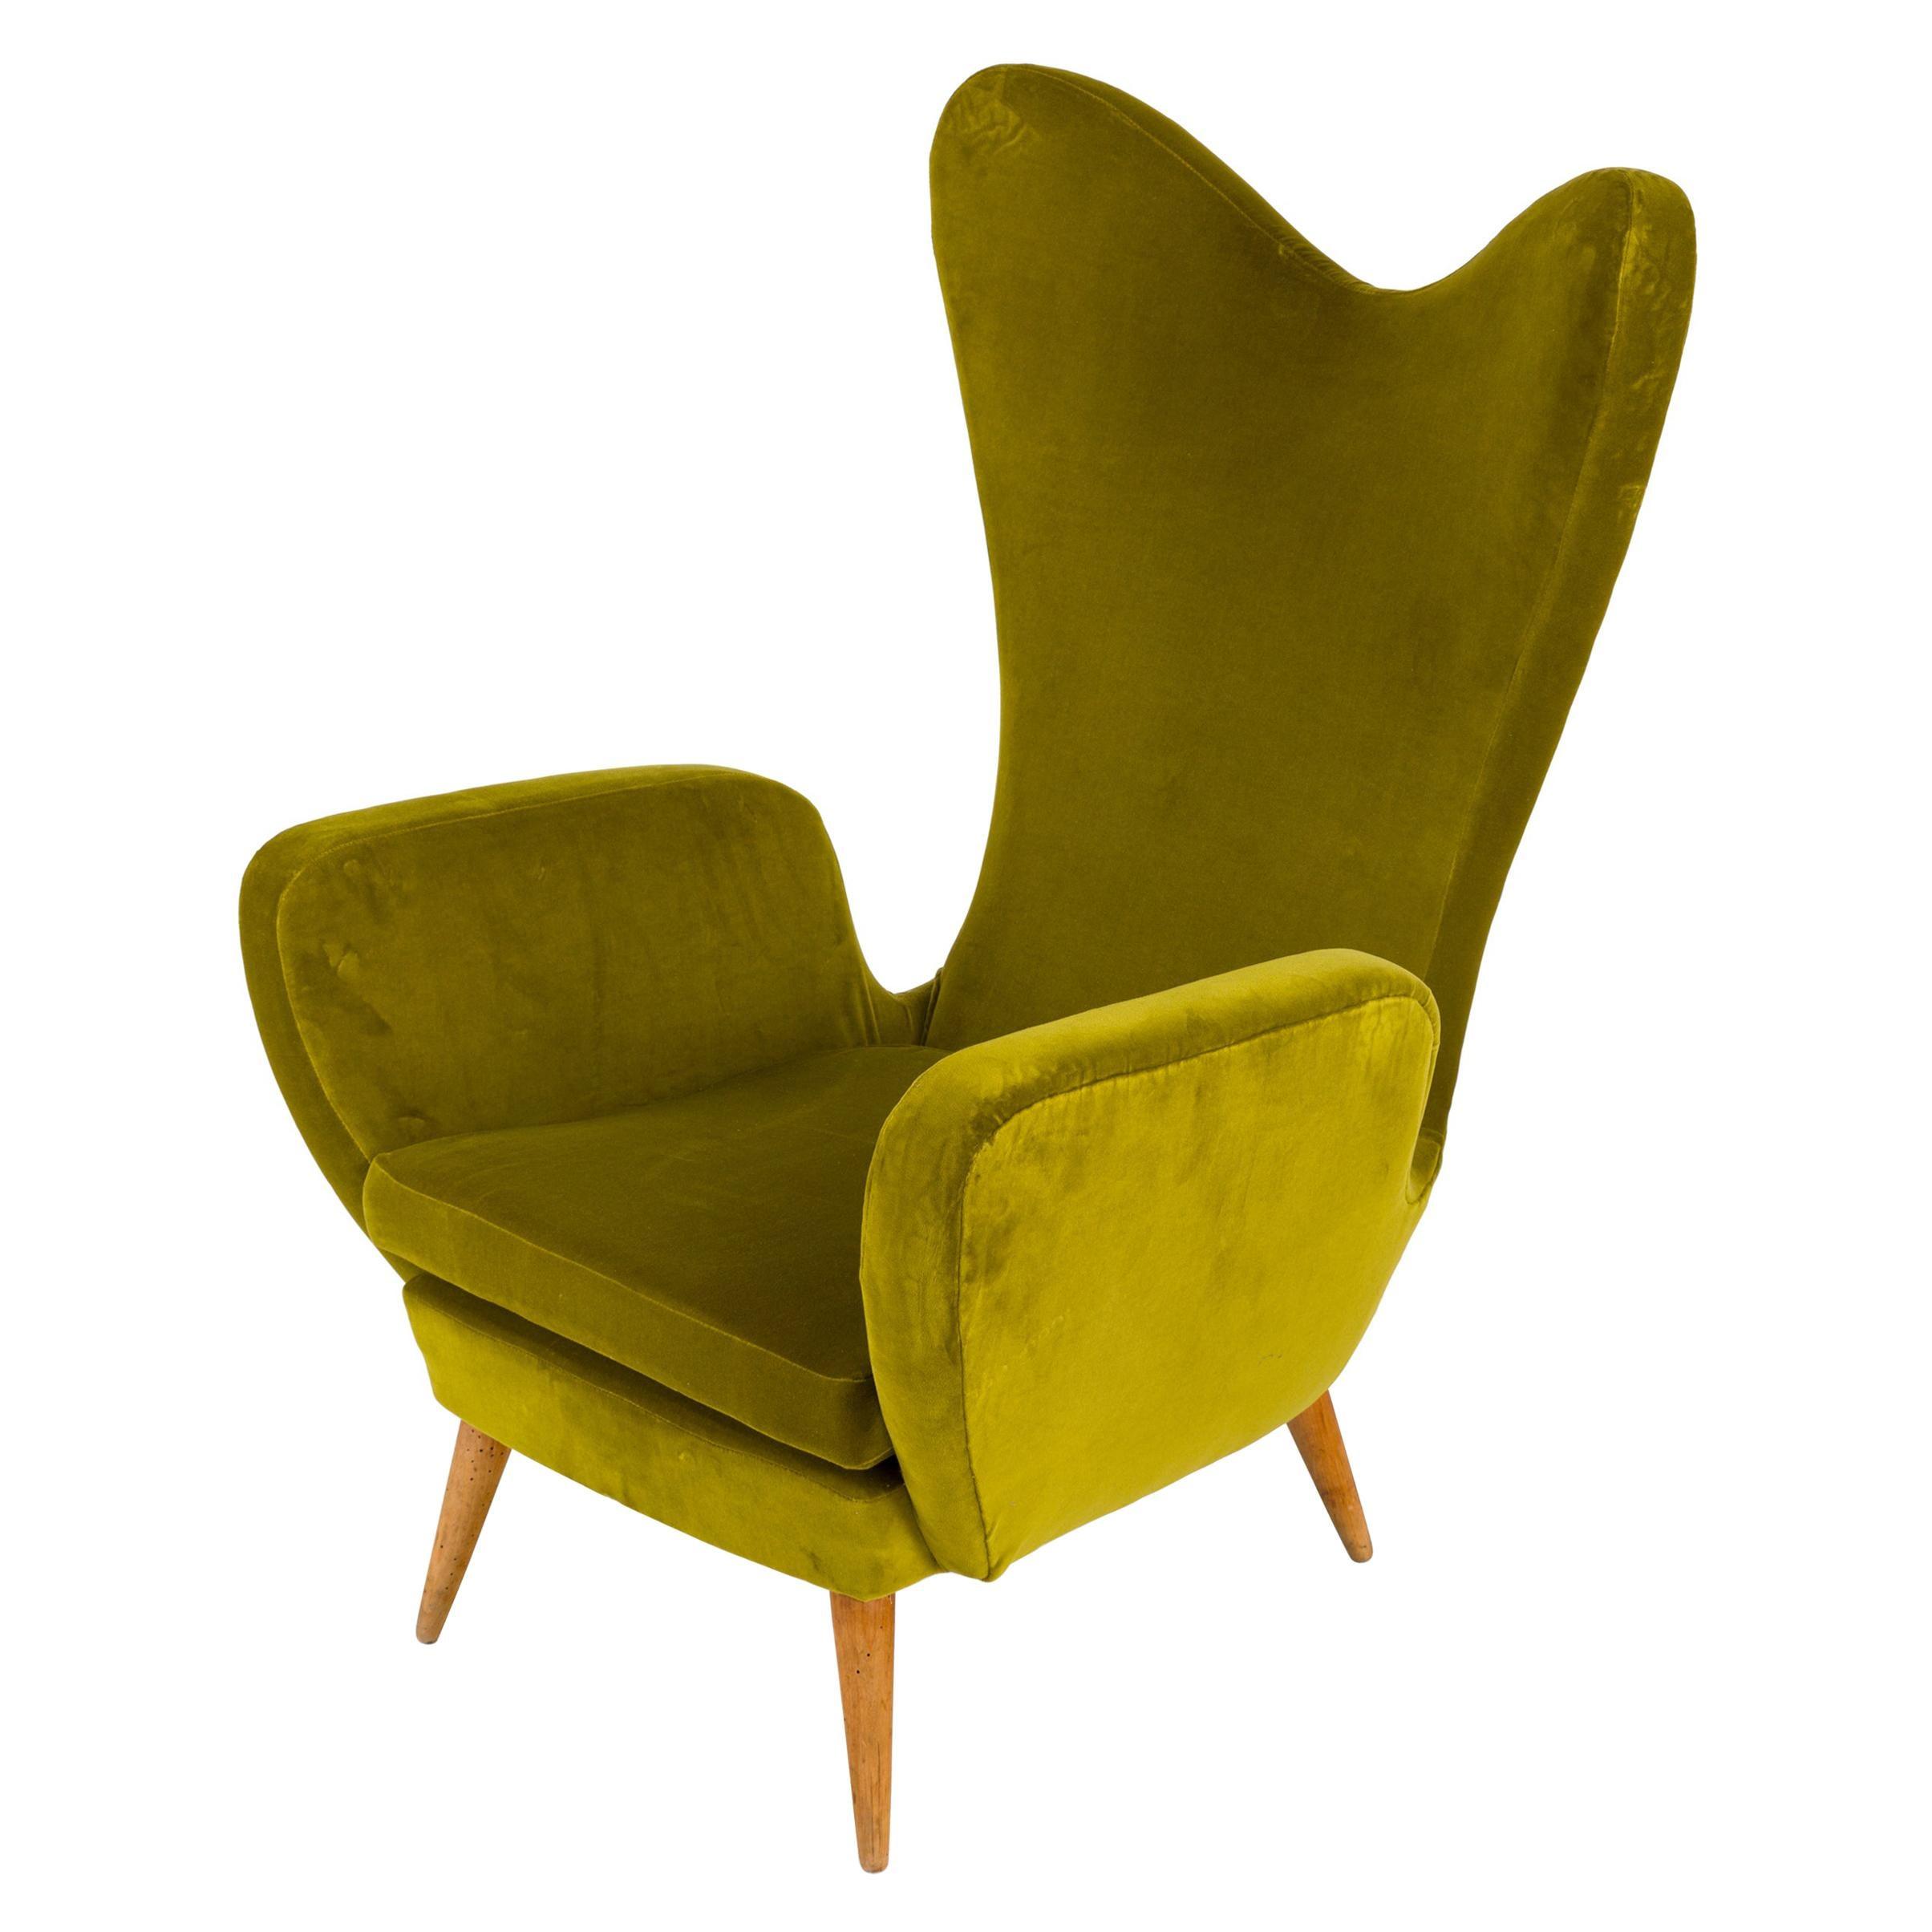 Green Velvet Mid-Century Lounge Chair, Italy, 1950s